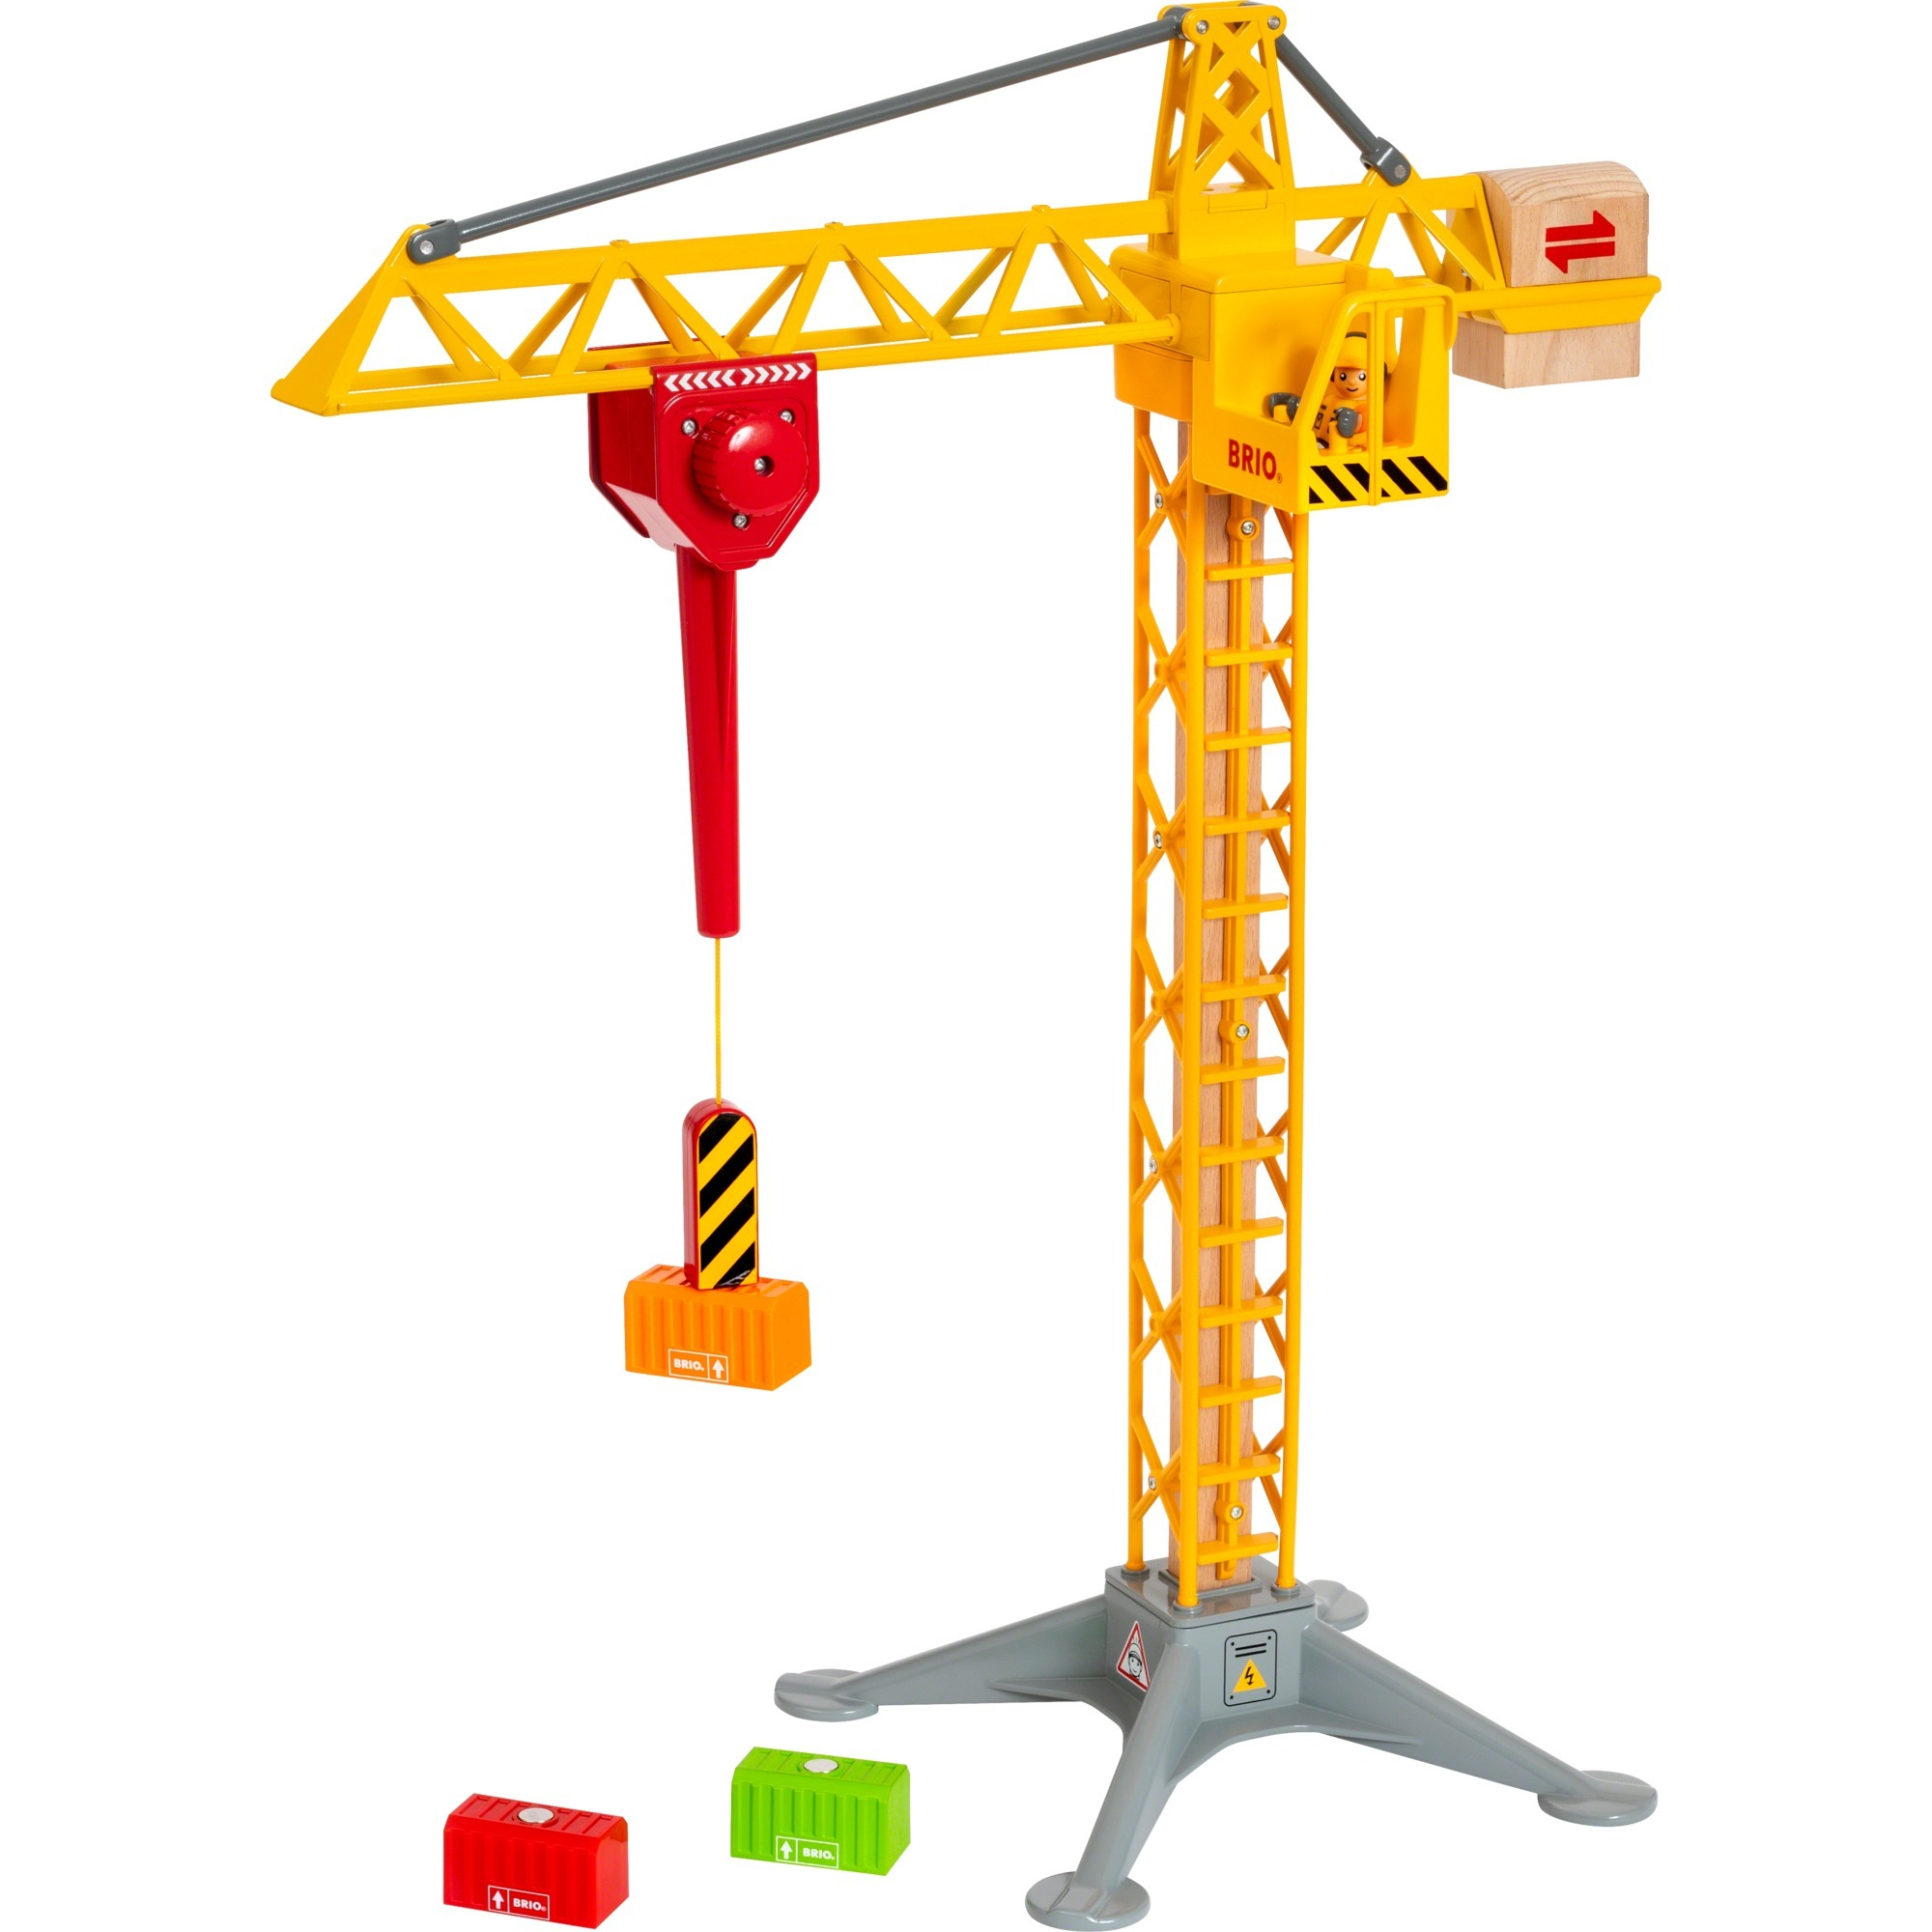 BRIO - Construction Crane with Lights (33935)